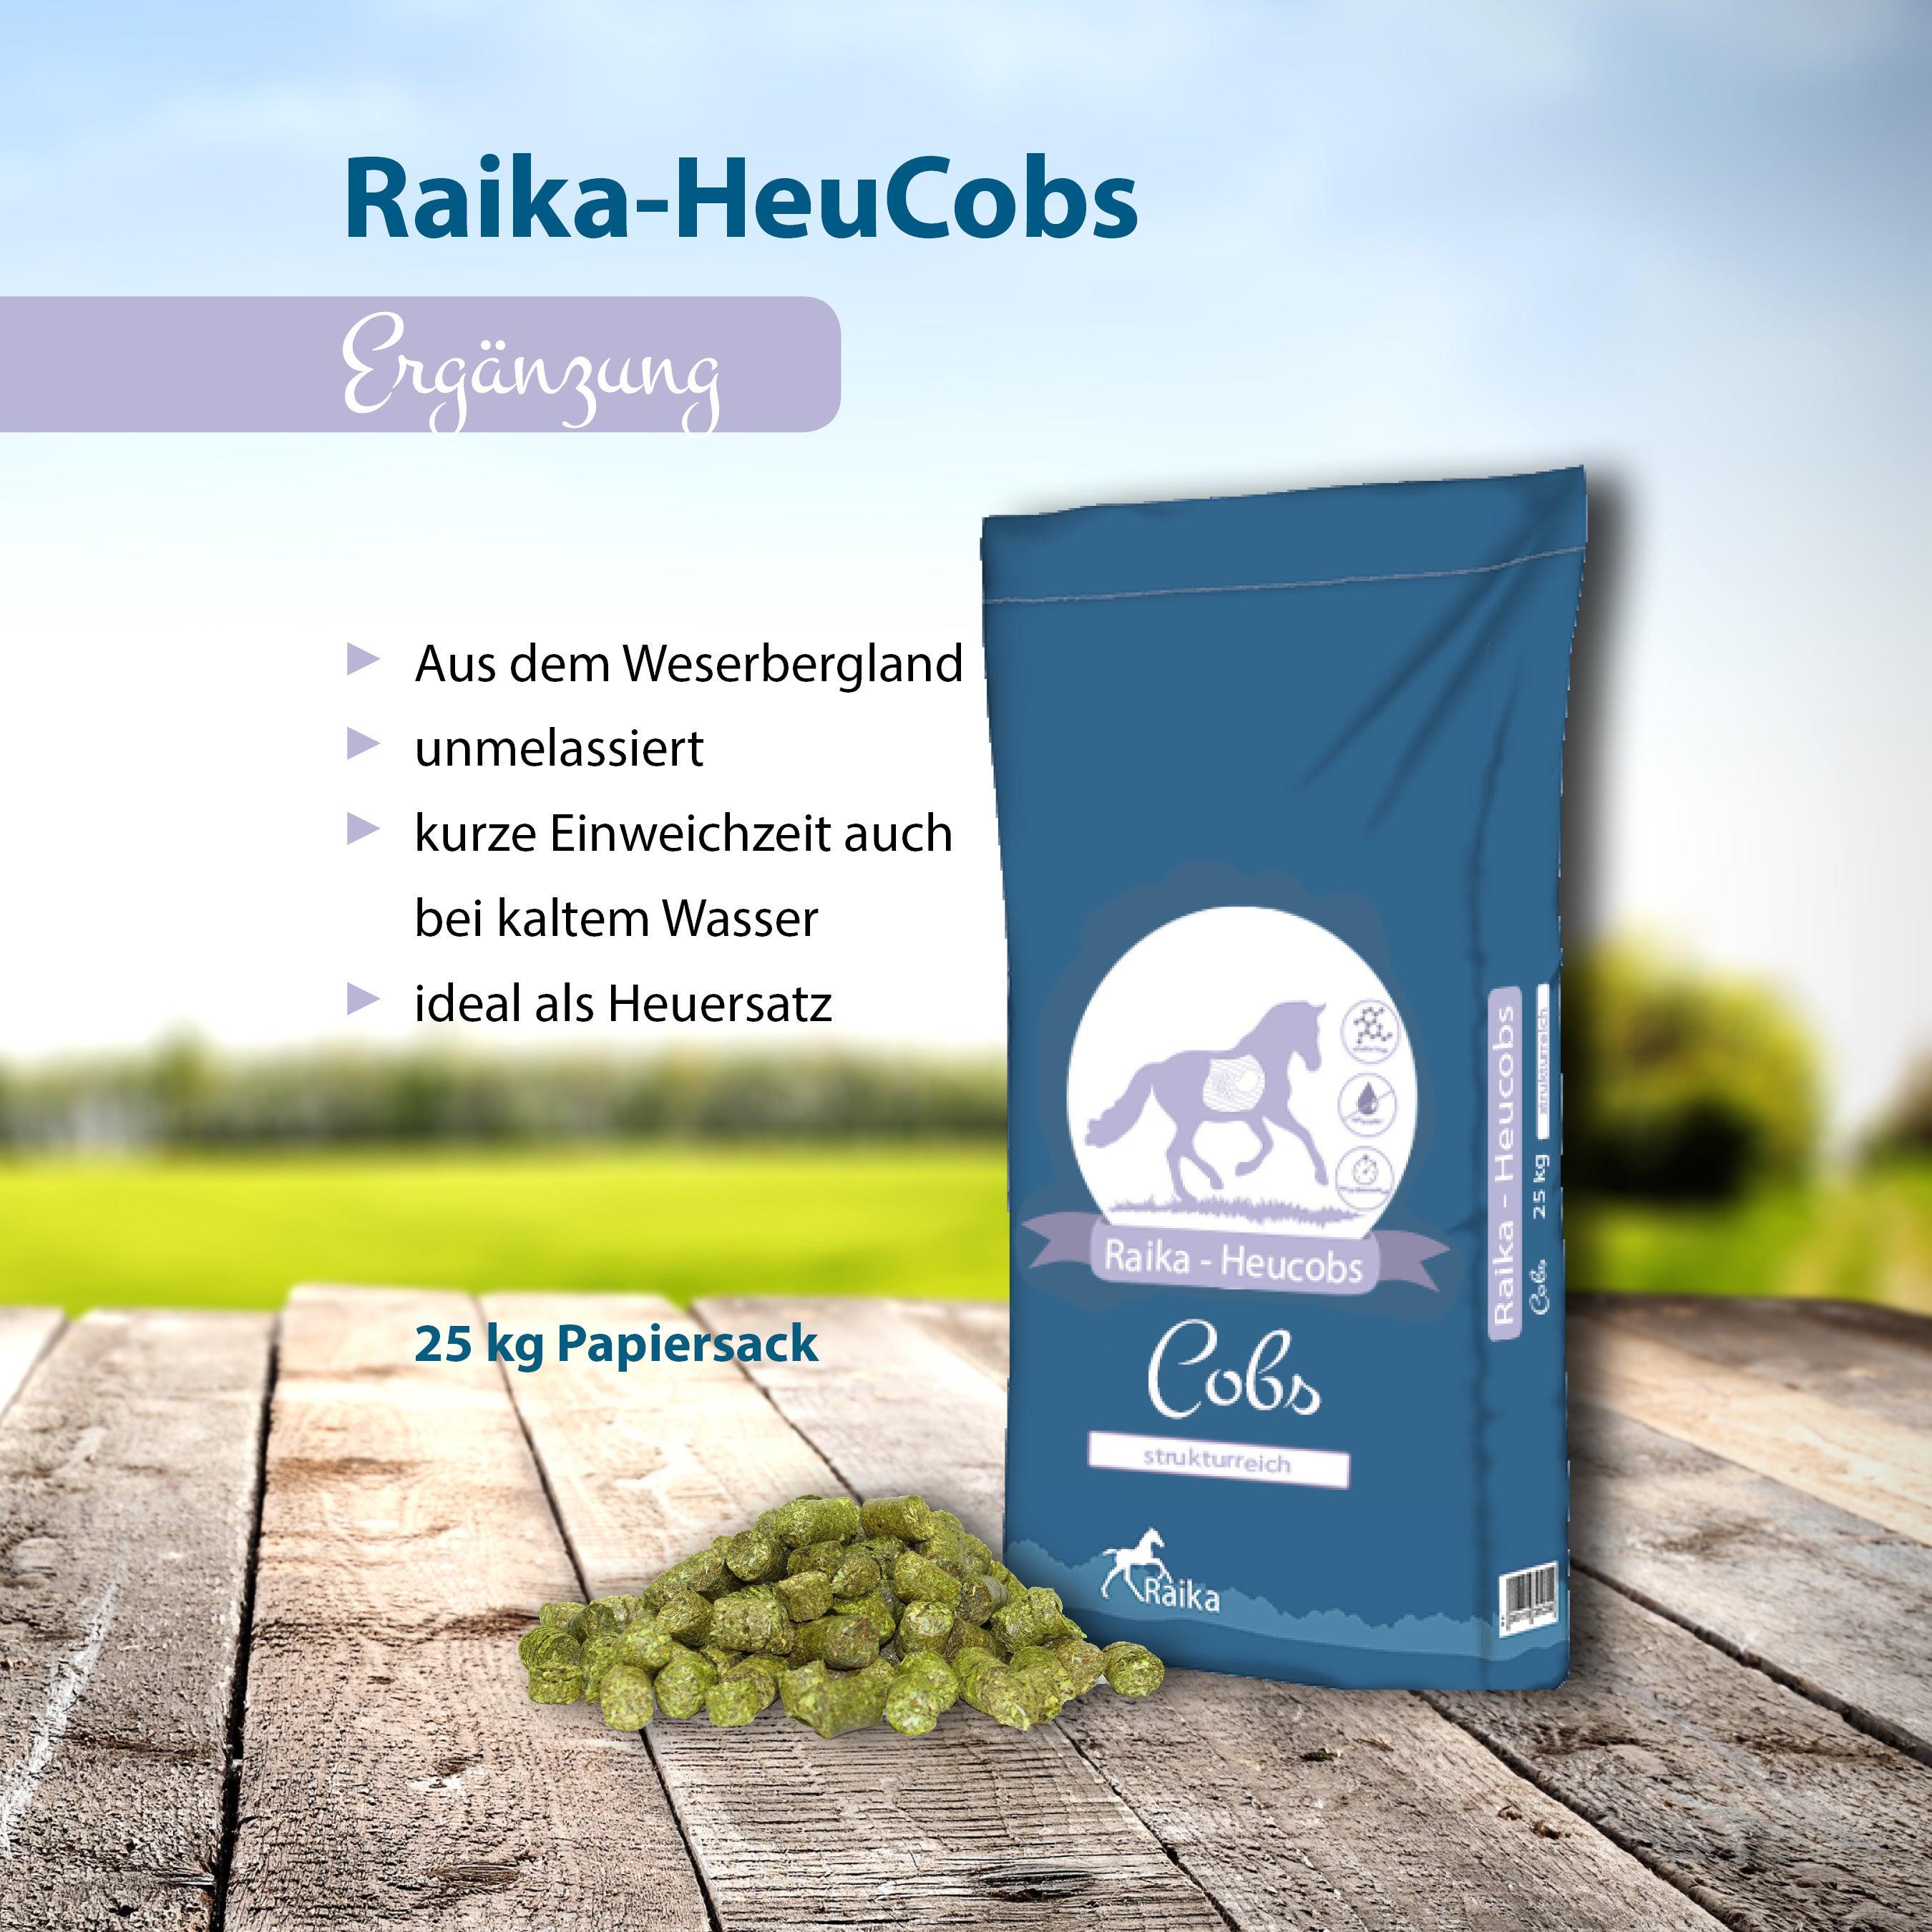 Raika-HeuCobs Pferdefutter